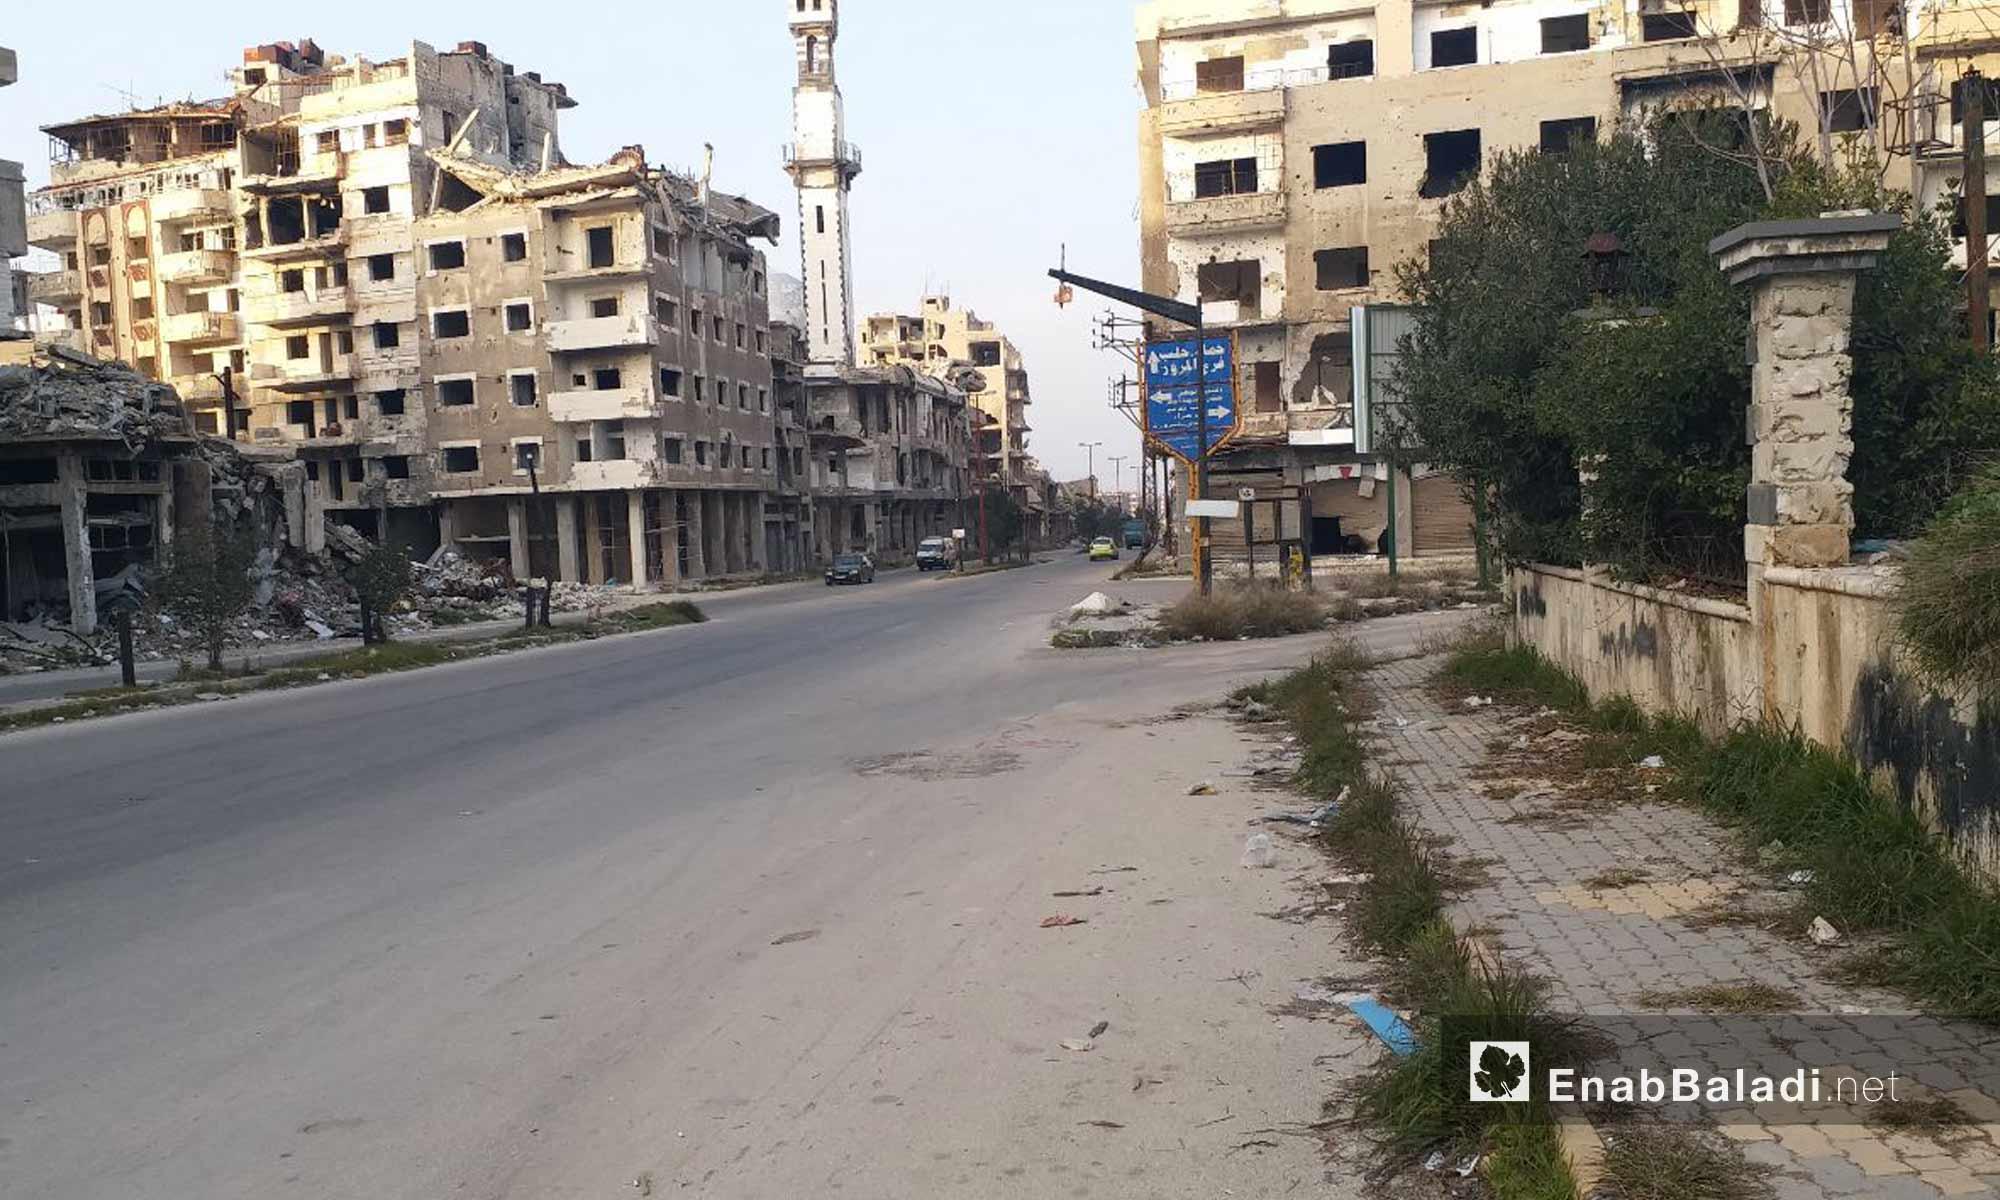 The Hama roadway and the secondary roads leading to the al-Khaldia January 24, 2019 (Enab Baladi)